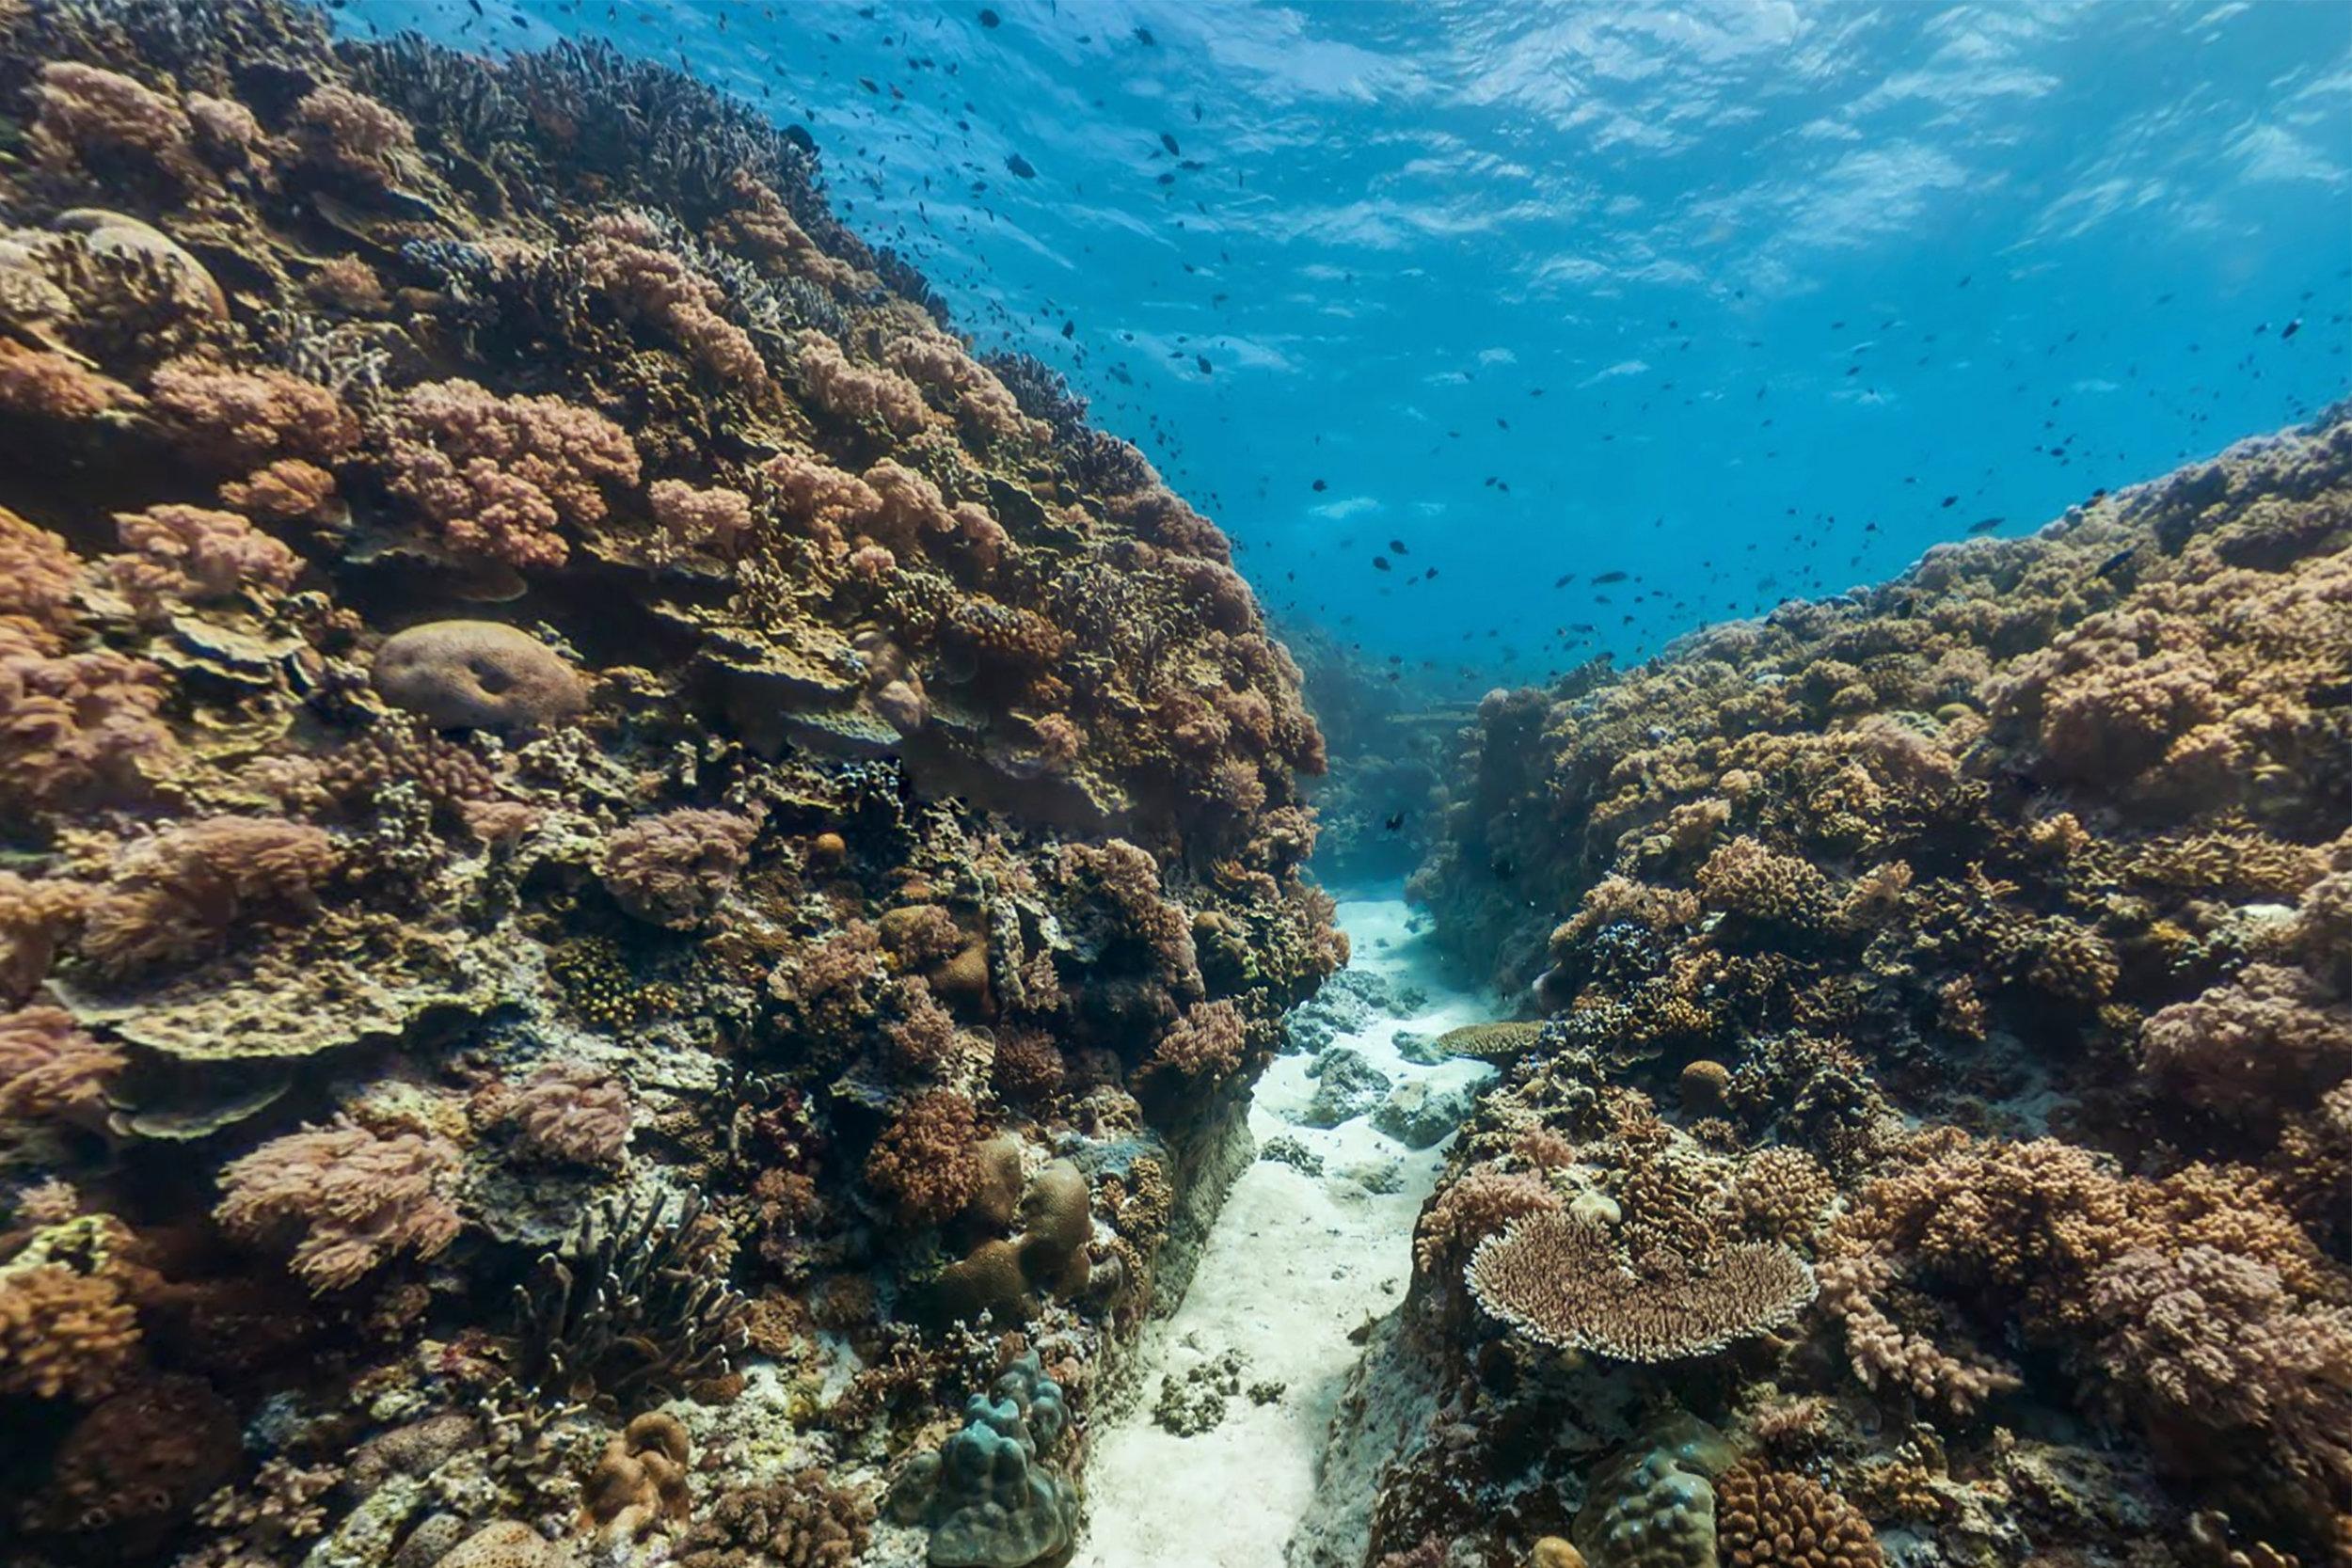 JESSIE BEAZLEY REEF, PHILIPPINES CREDIT: THE OCEAN AGENCY / XL CATLIN SEAVIEW SURVEY